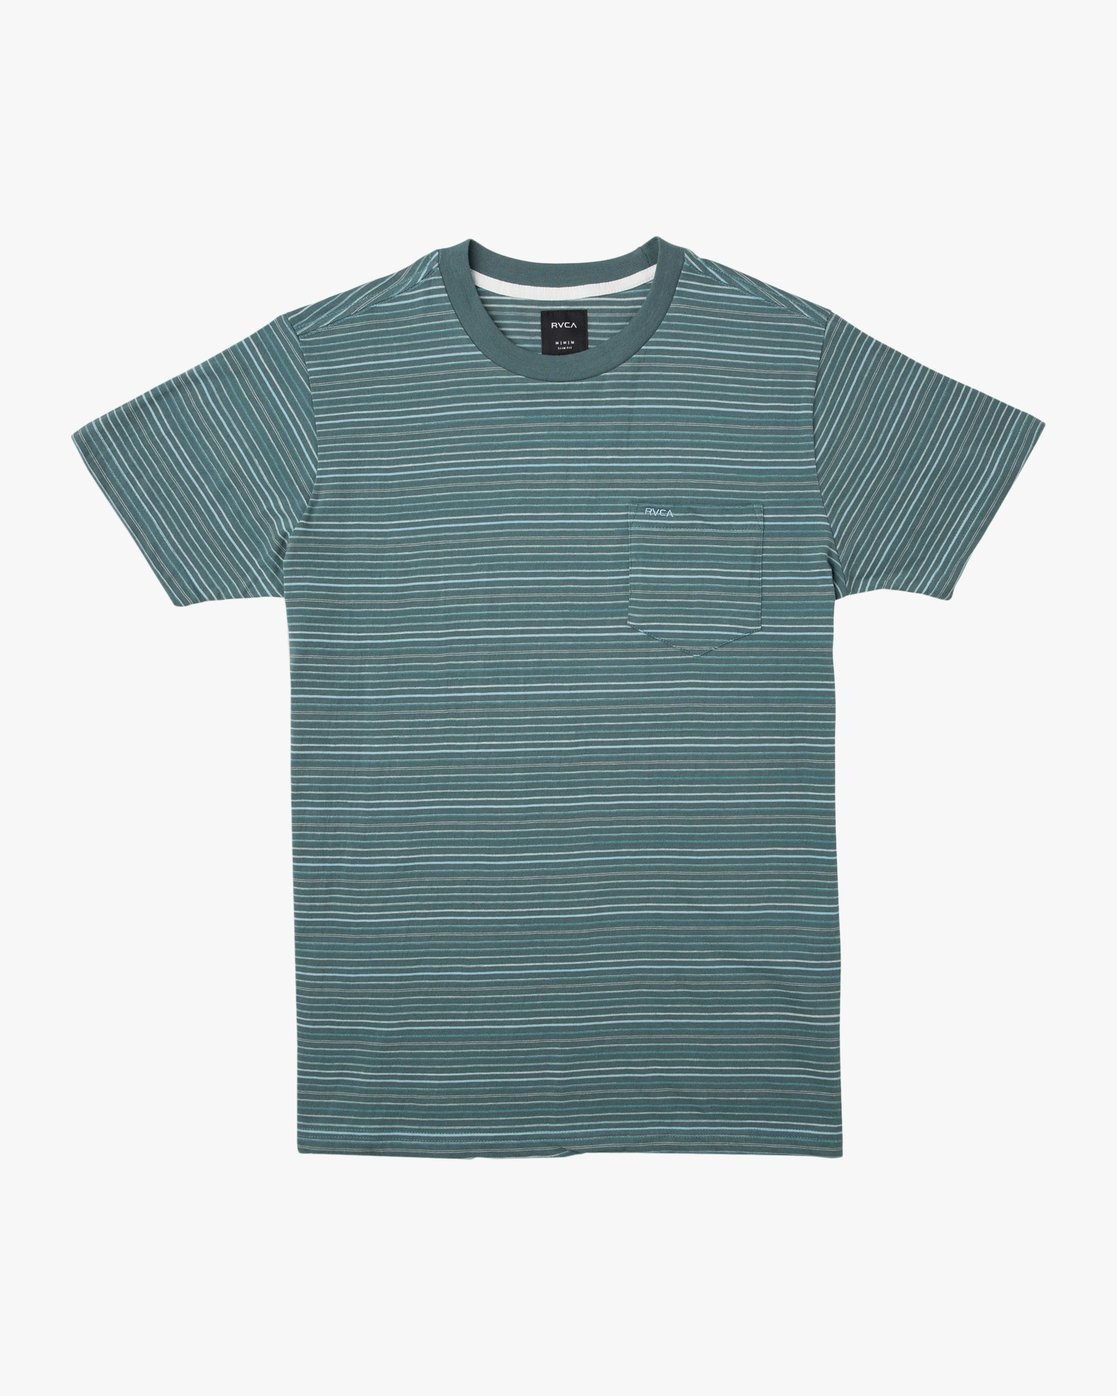 0 Warren Stripe T-Shirt Green N1KTRBRVP9 RVCA